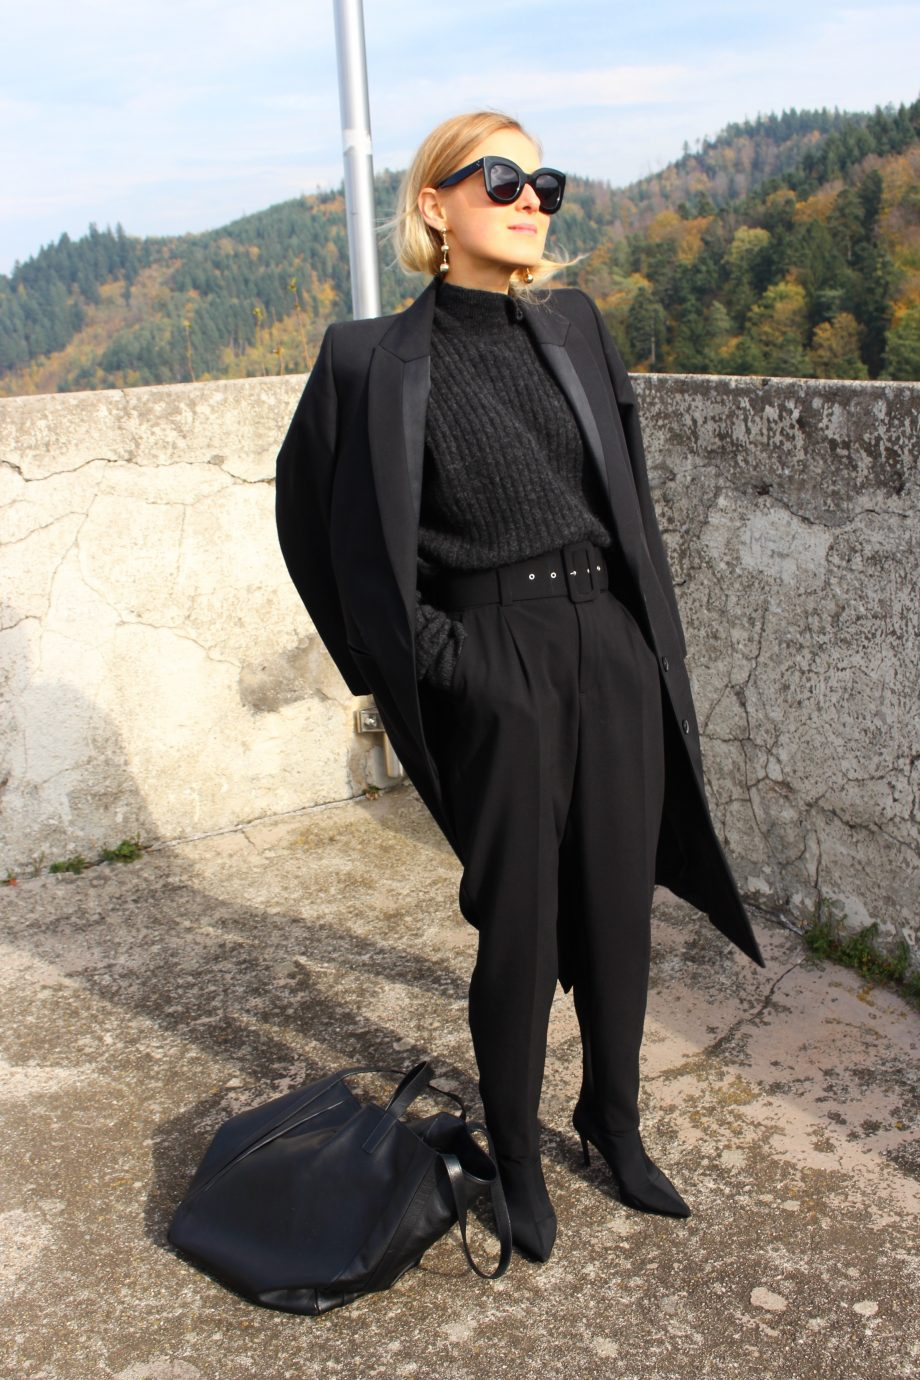 The Black Coat |05.11.2017